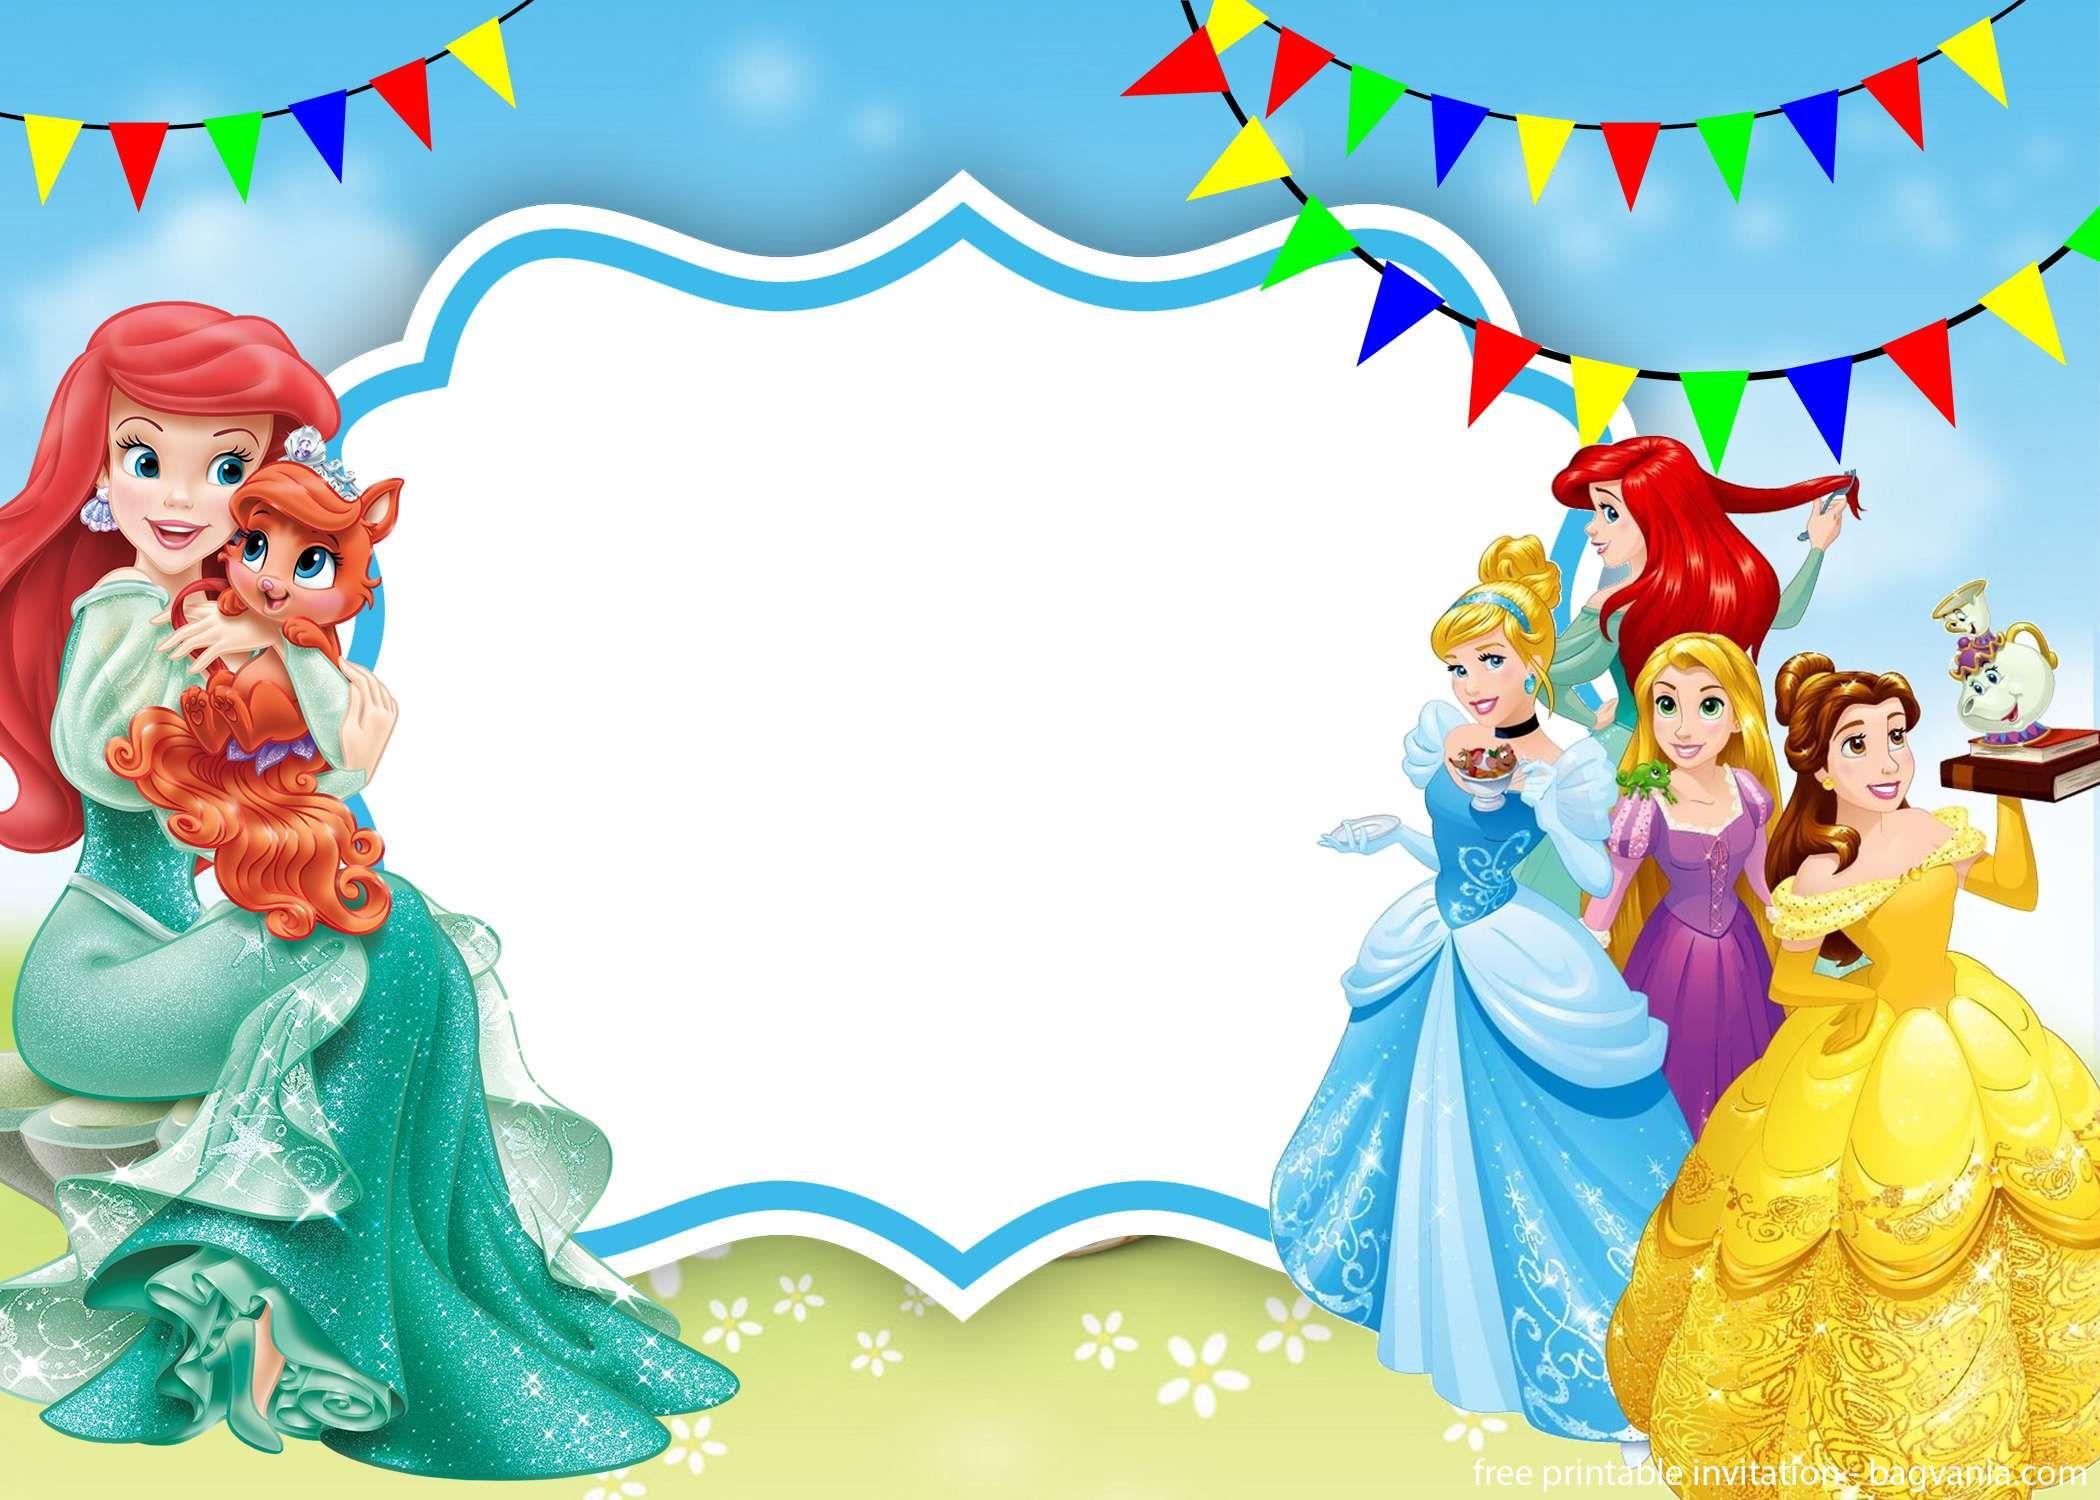 free printable disney princessess